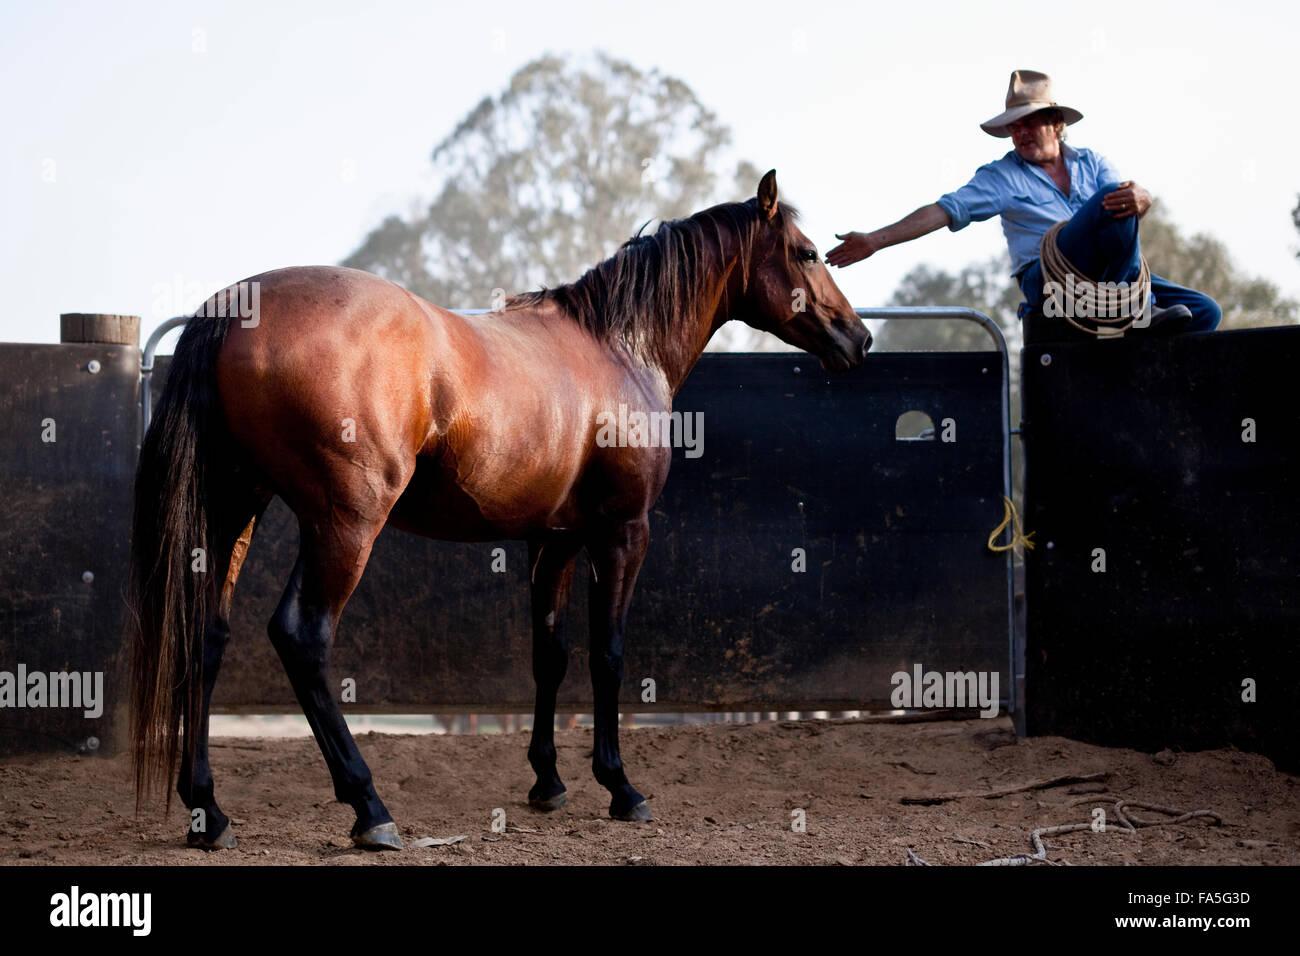 Steve Baird of Bogong Horseback Adventures training a colt Australian Stock Horse in the round yard at Spring Spur. - Stock Image